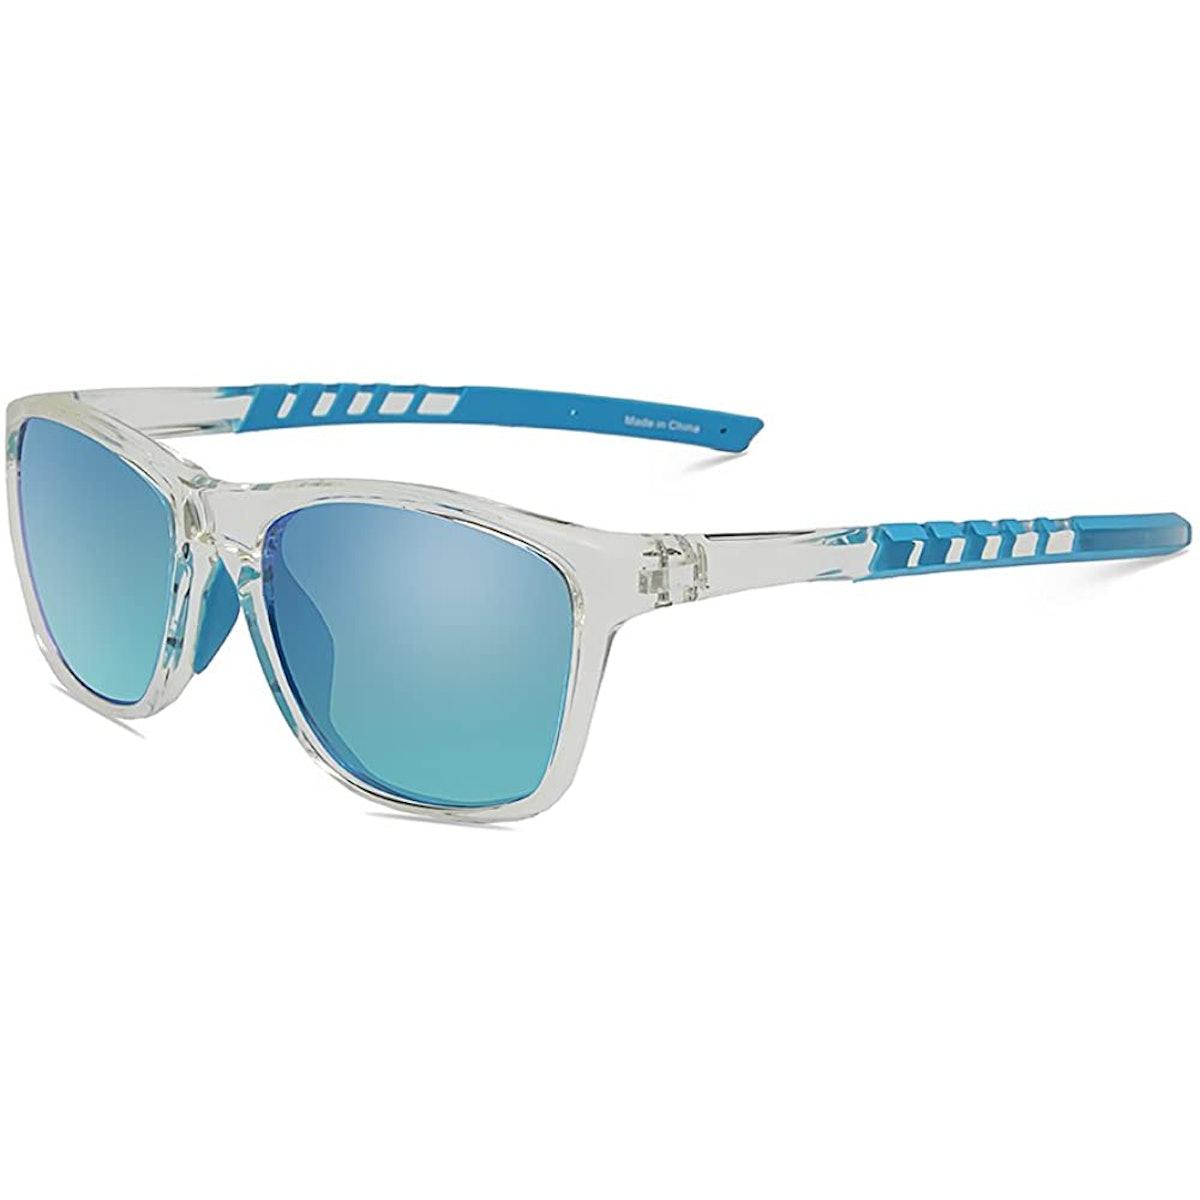 JOJEN Ultralight Polarized Sports Sunglasses